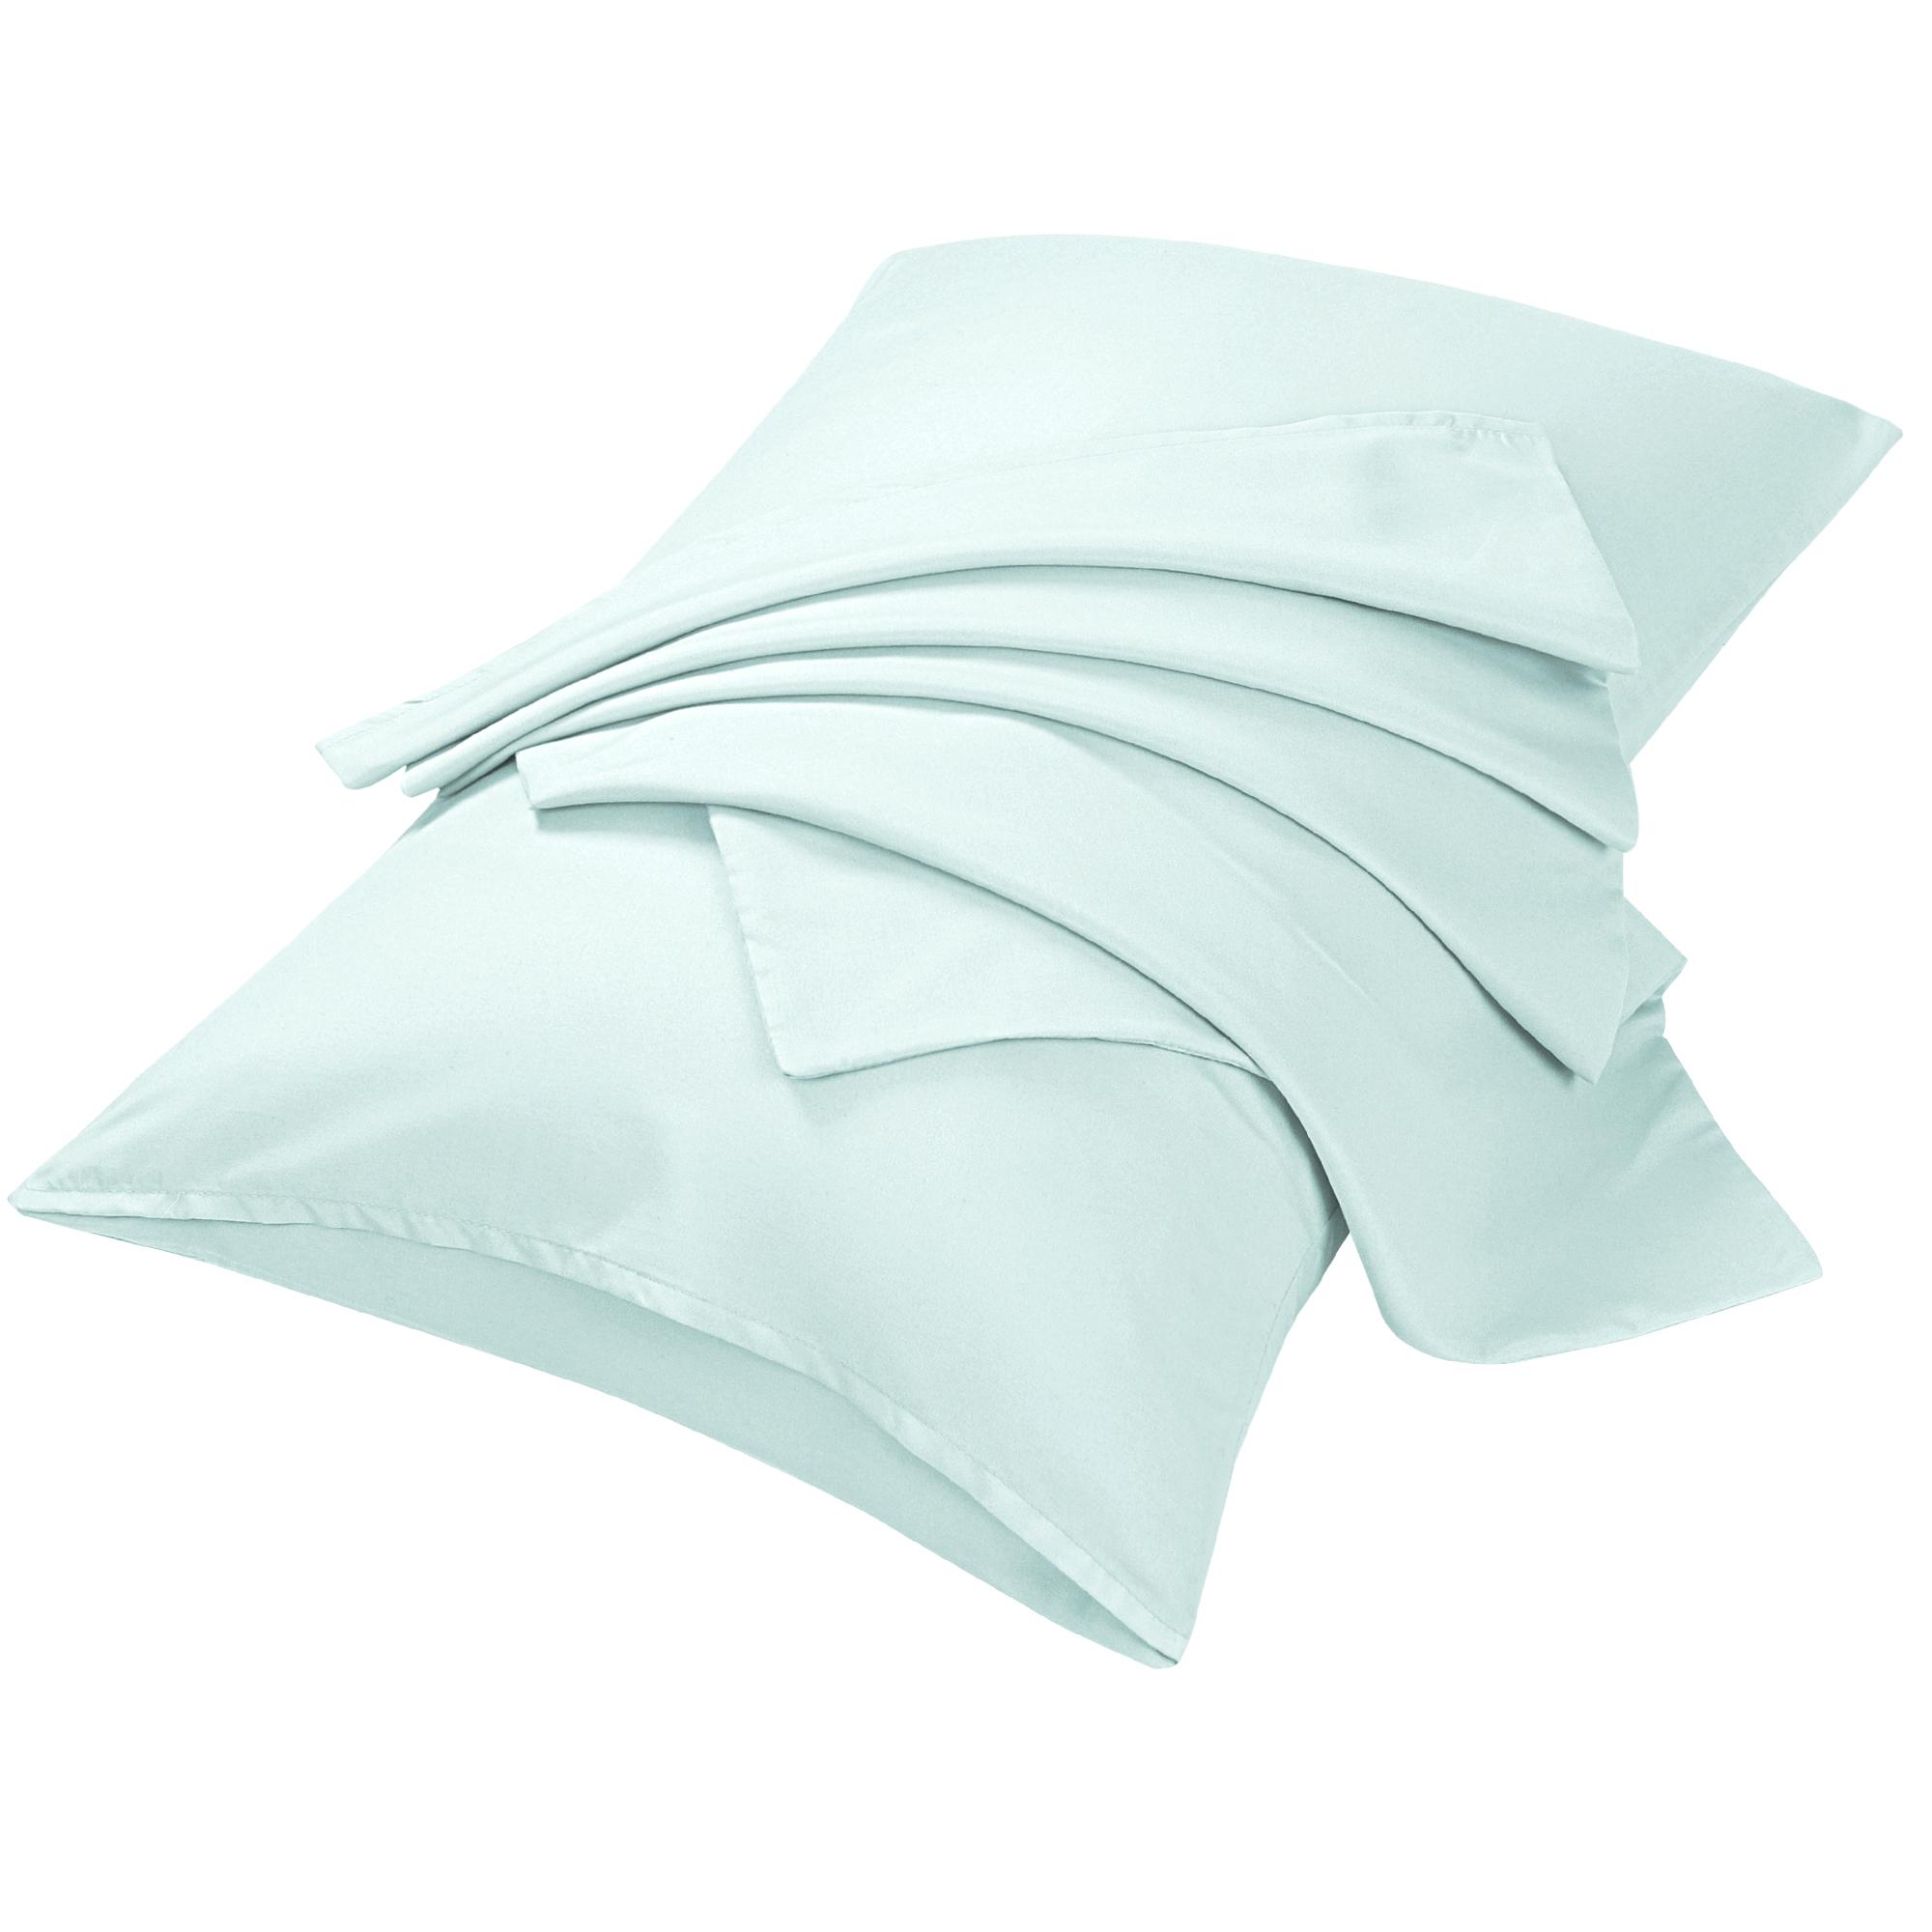 "2pcs Pillowcases Soft Microfiber, No Wrinkle, Light Gray Standard (20"" x 26"")"